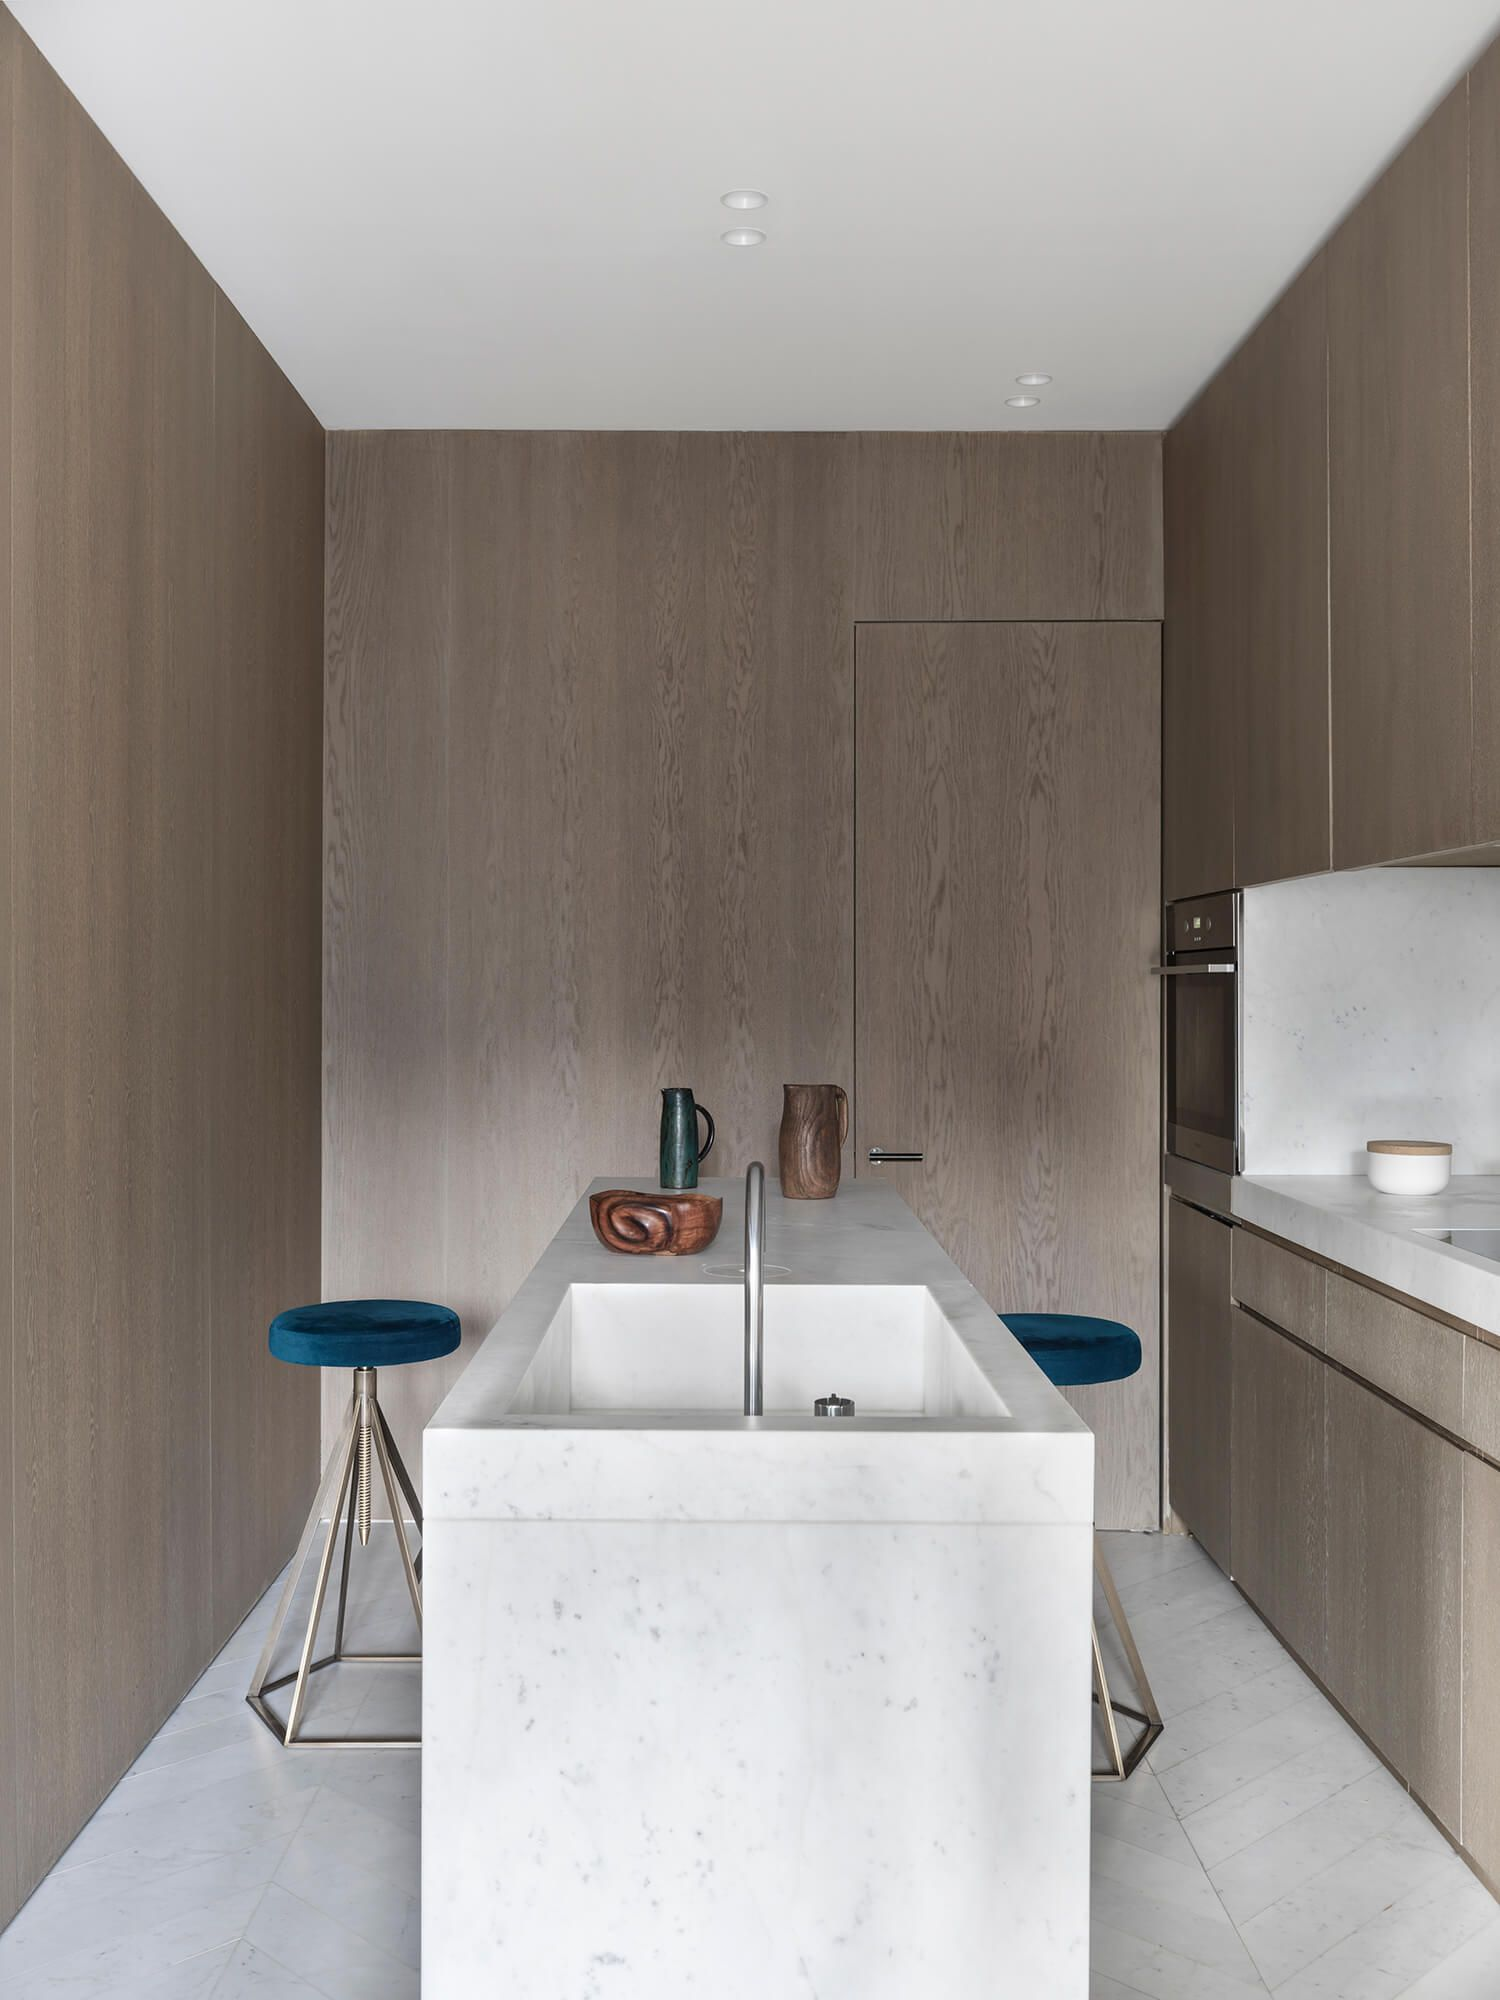 Kitchen Jr Apartment By Nicolas Schuybroek Est Living